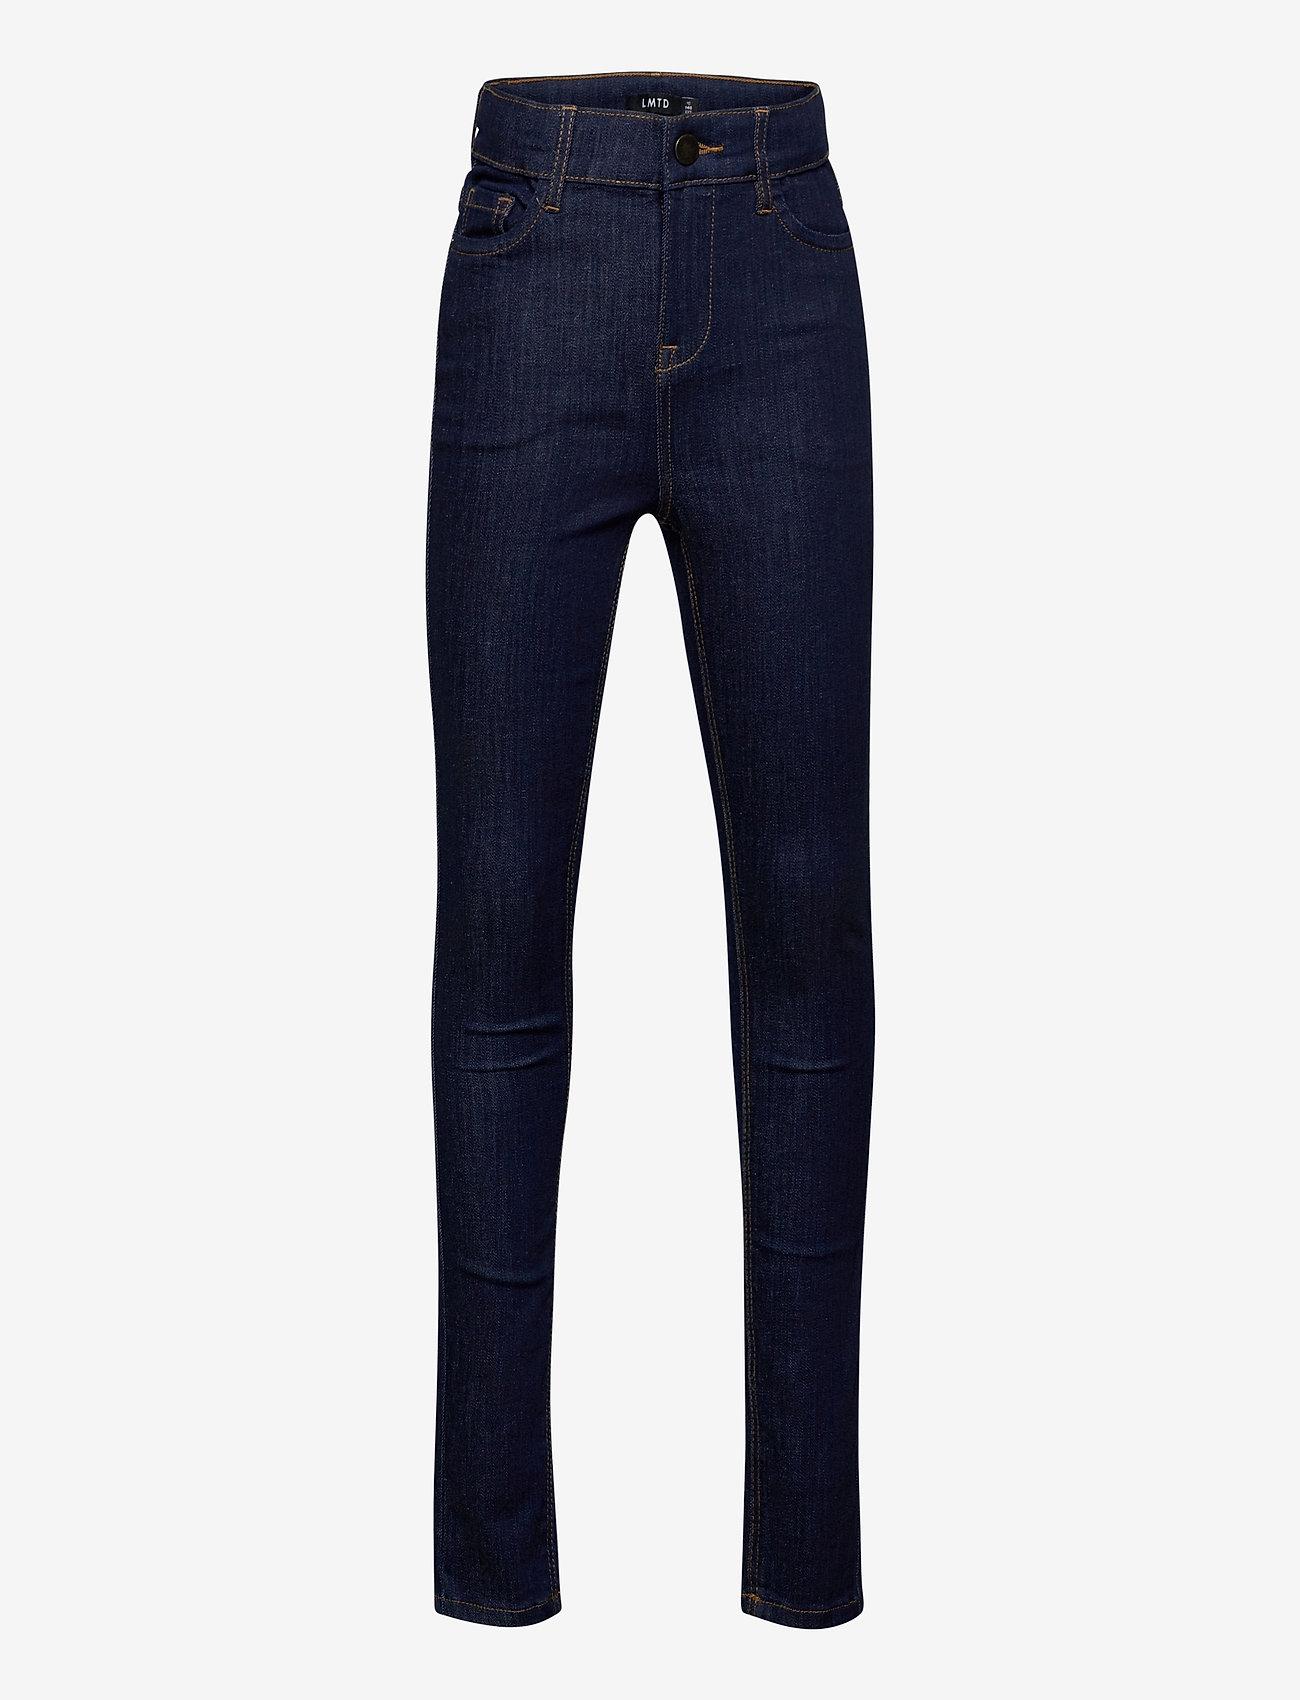 LMTD - NLFPIL DNMTEJAS 3340 HW PANT - jeans - dark blue denim - 0